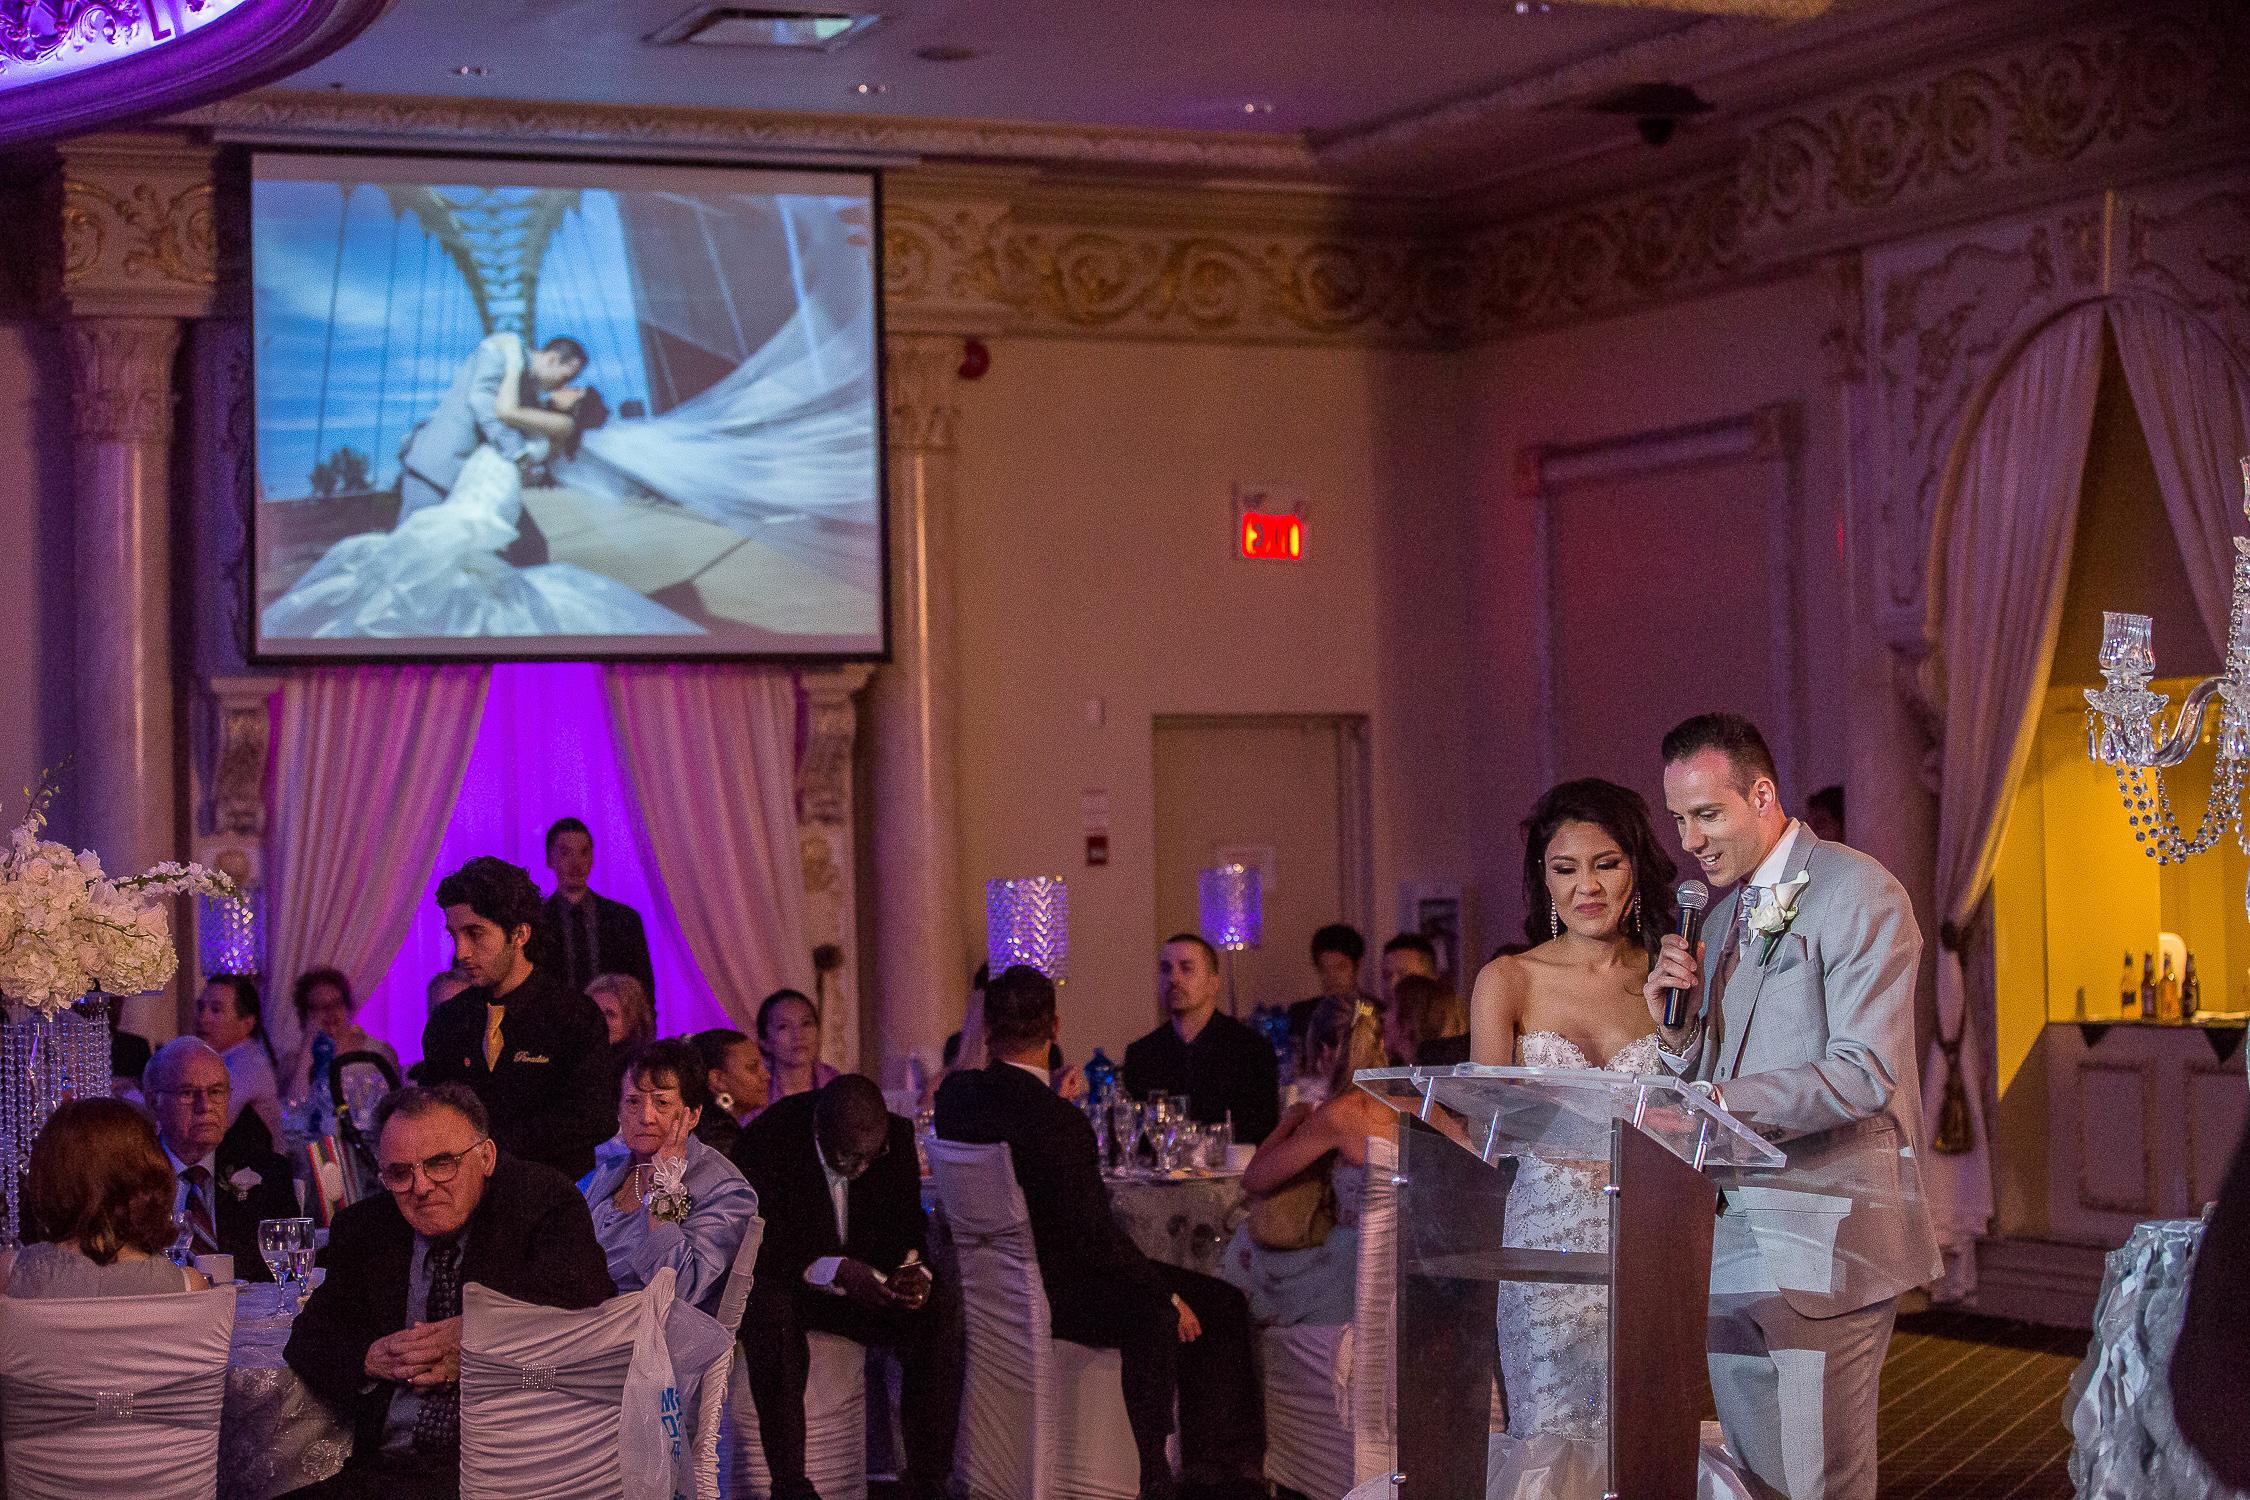 Paradise-Banquet-Hall-Wedding-Vaughan-Ontario-0090.jpg